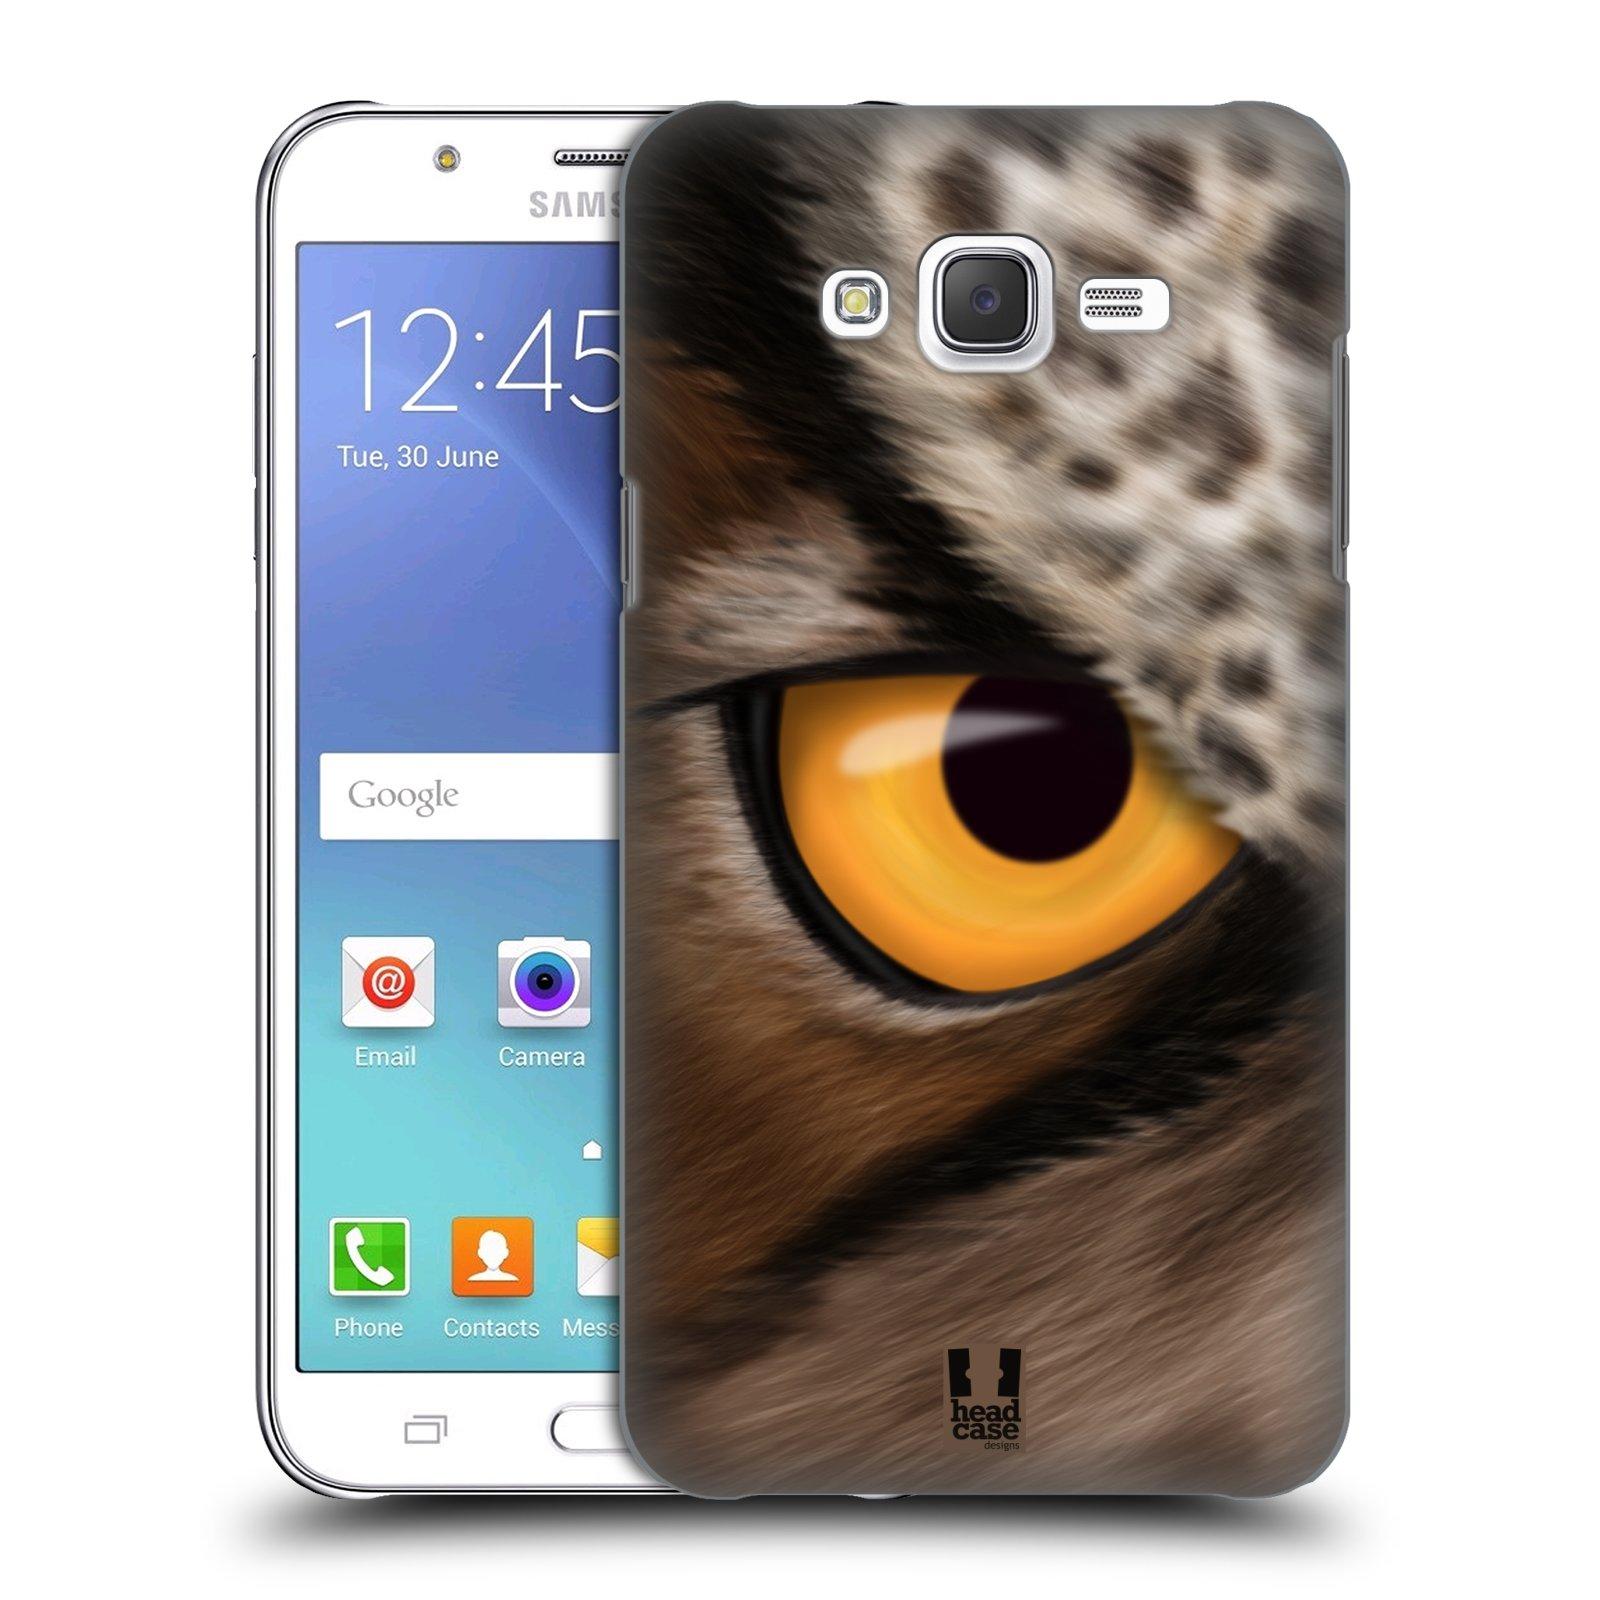 HEAD CASE plastový obal na mobil SAMSUNG Galaxy J7, J700 vzor pohled zvířete oko sova